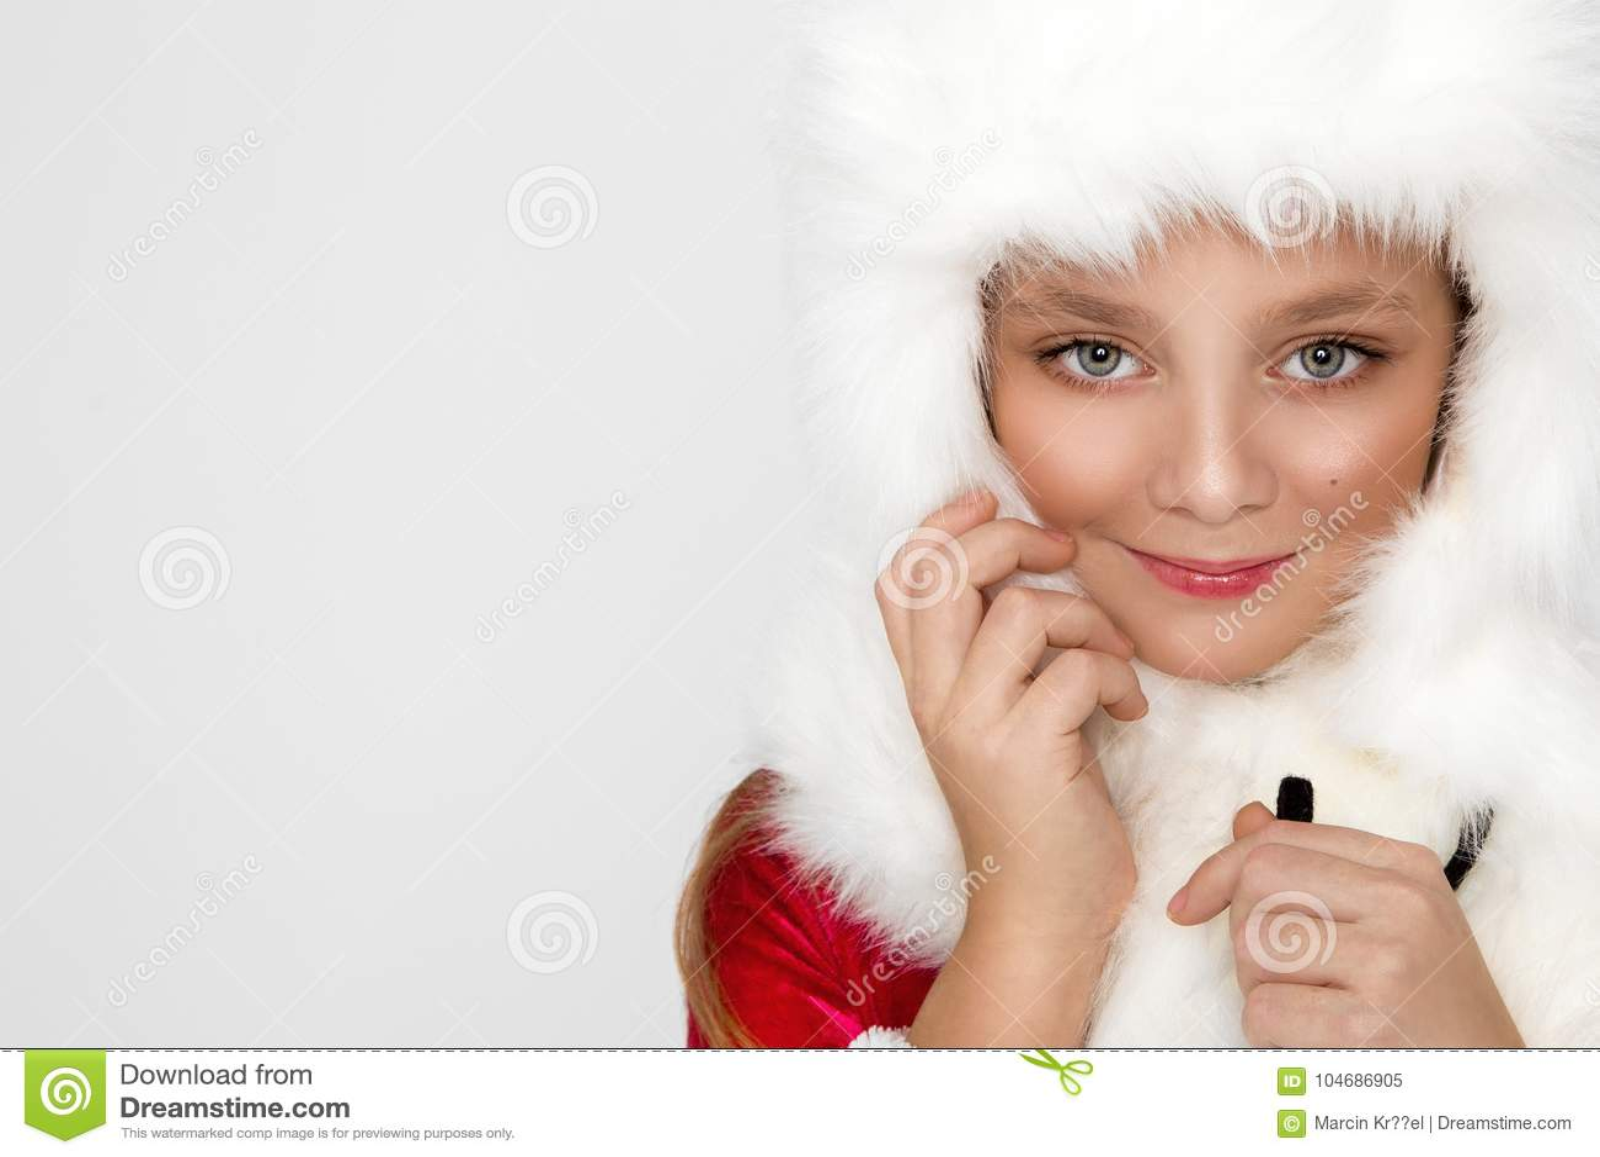 9288ef34d Stunning Beautiful Little Girl With Long Blond Hair